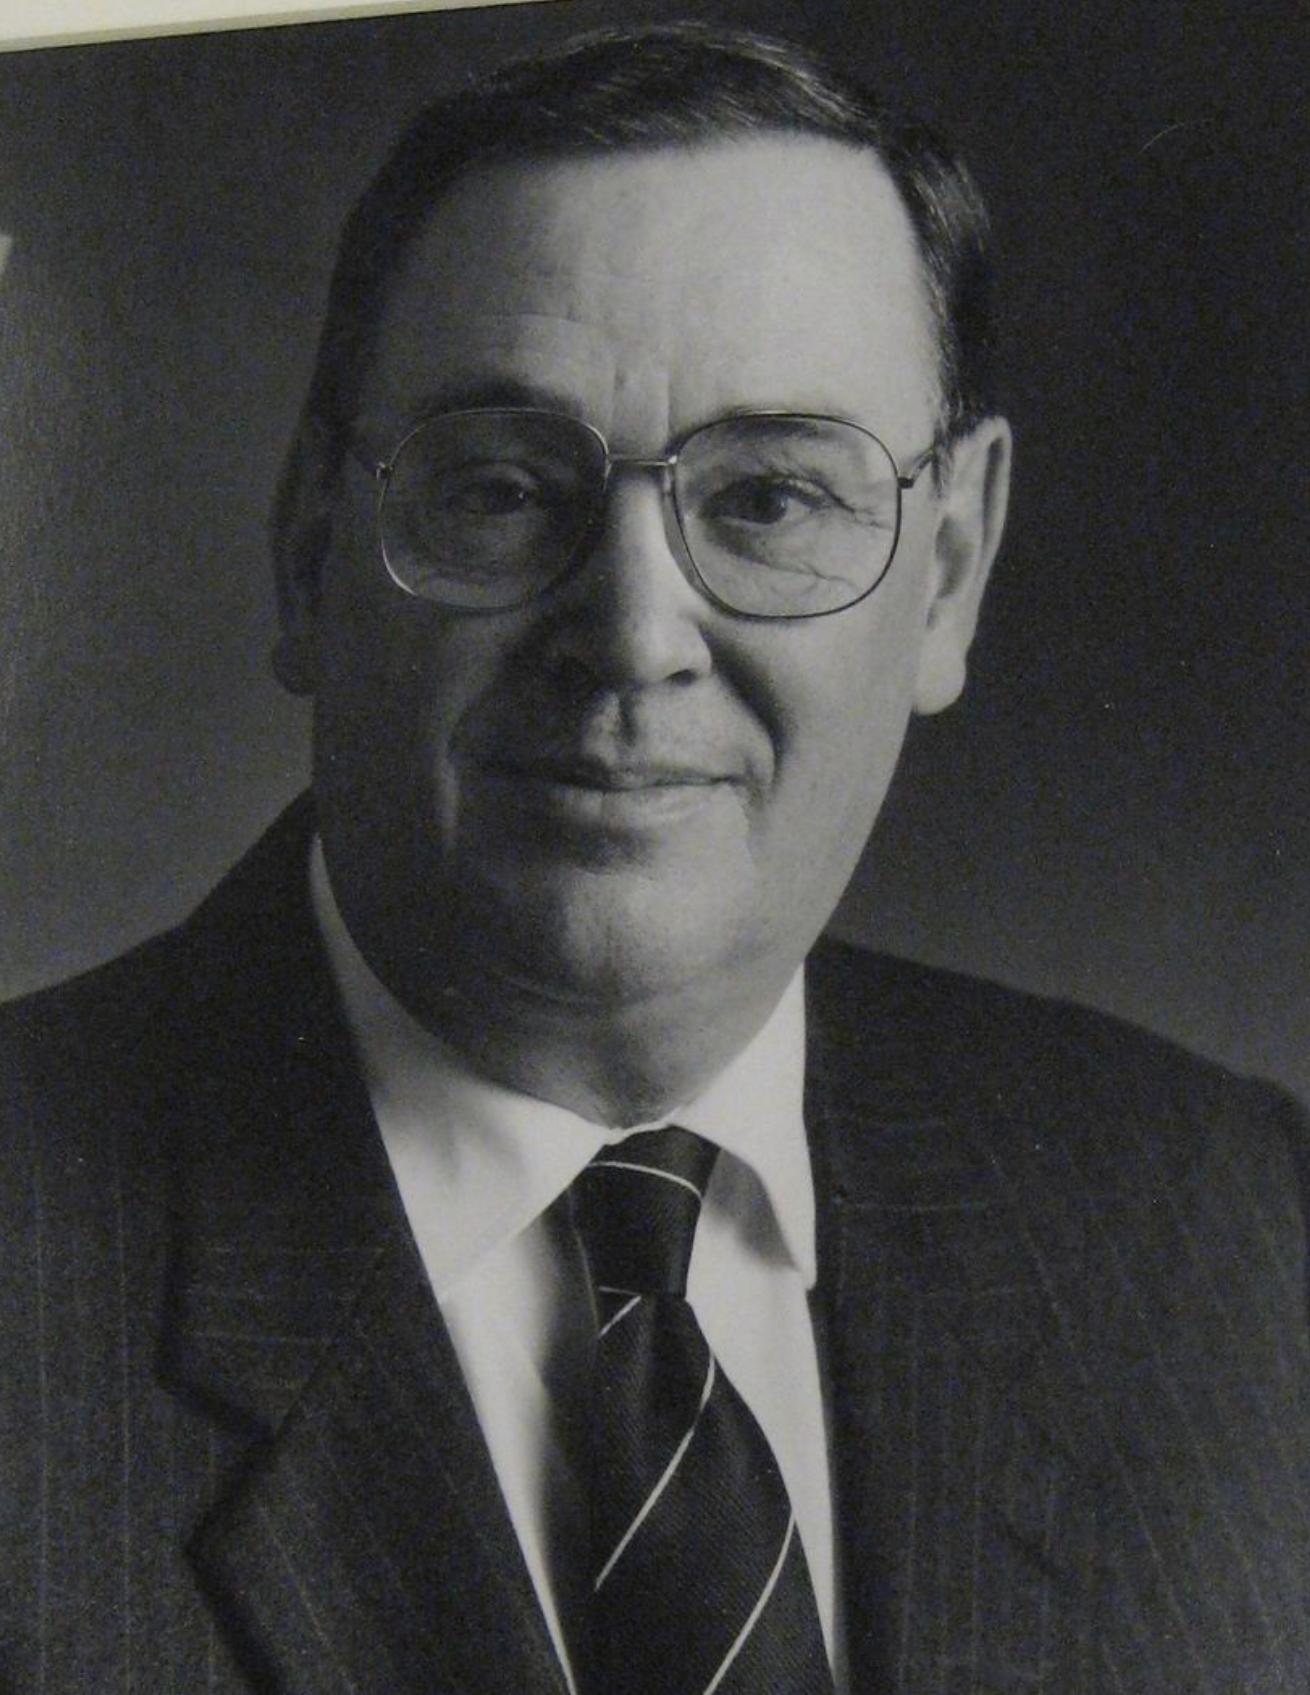 Robertson<br>1979-1986